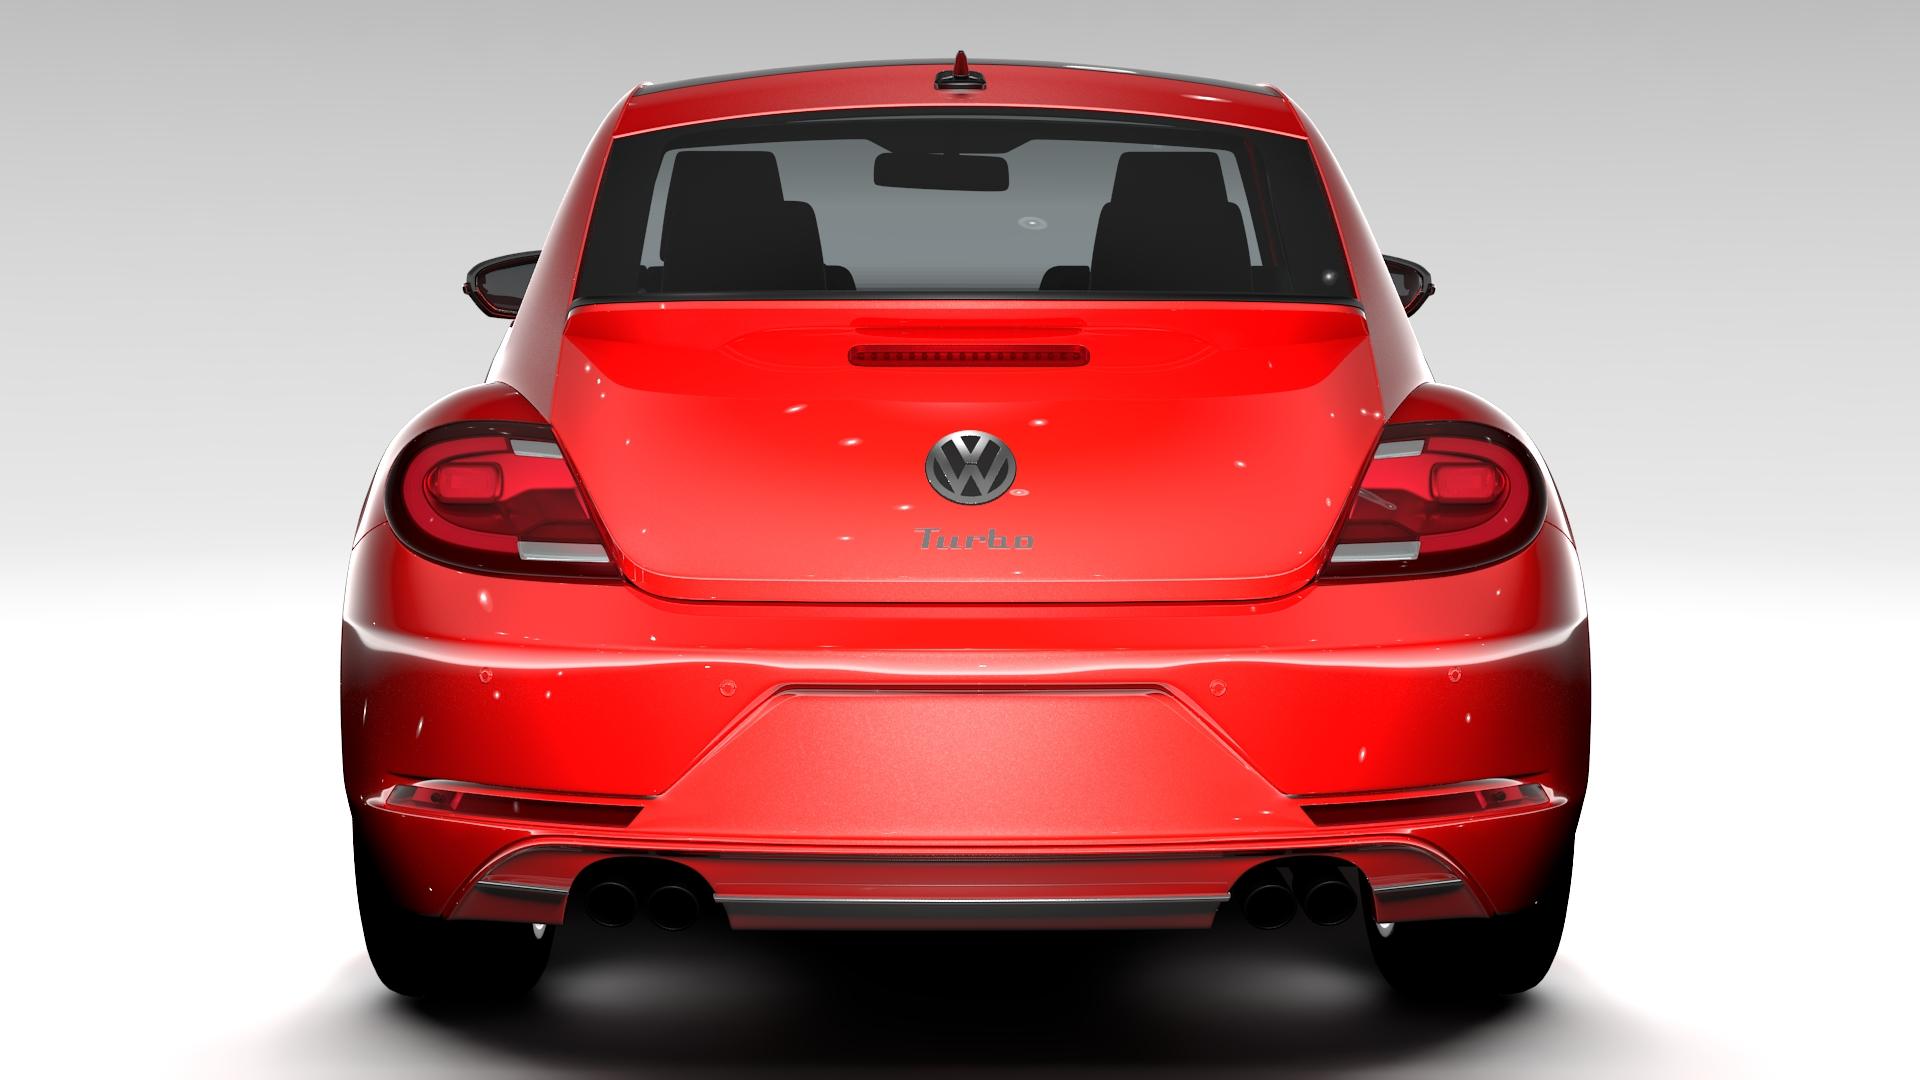 vw beetle turbo 2017 3d model 3ds max fbx c4d lwo ma mb hrc xsi obj 221662